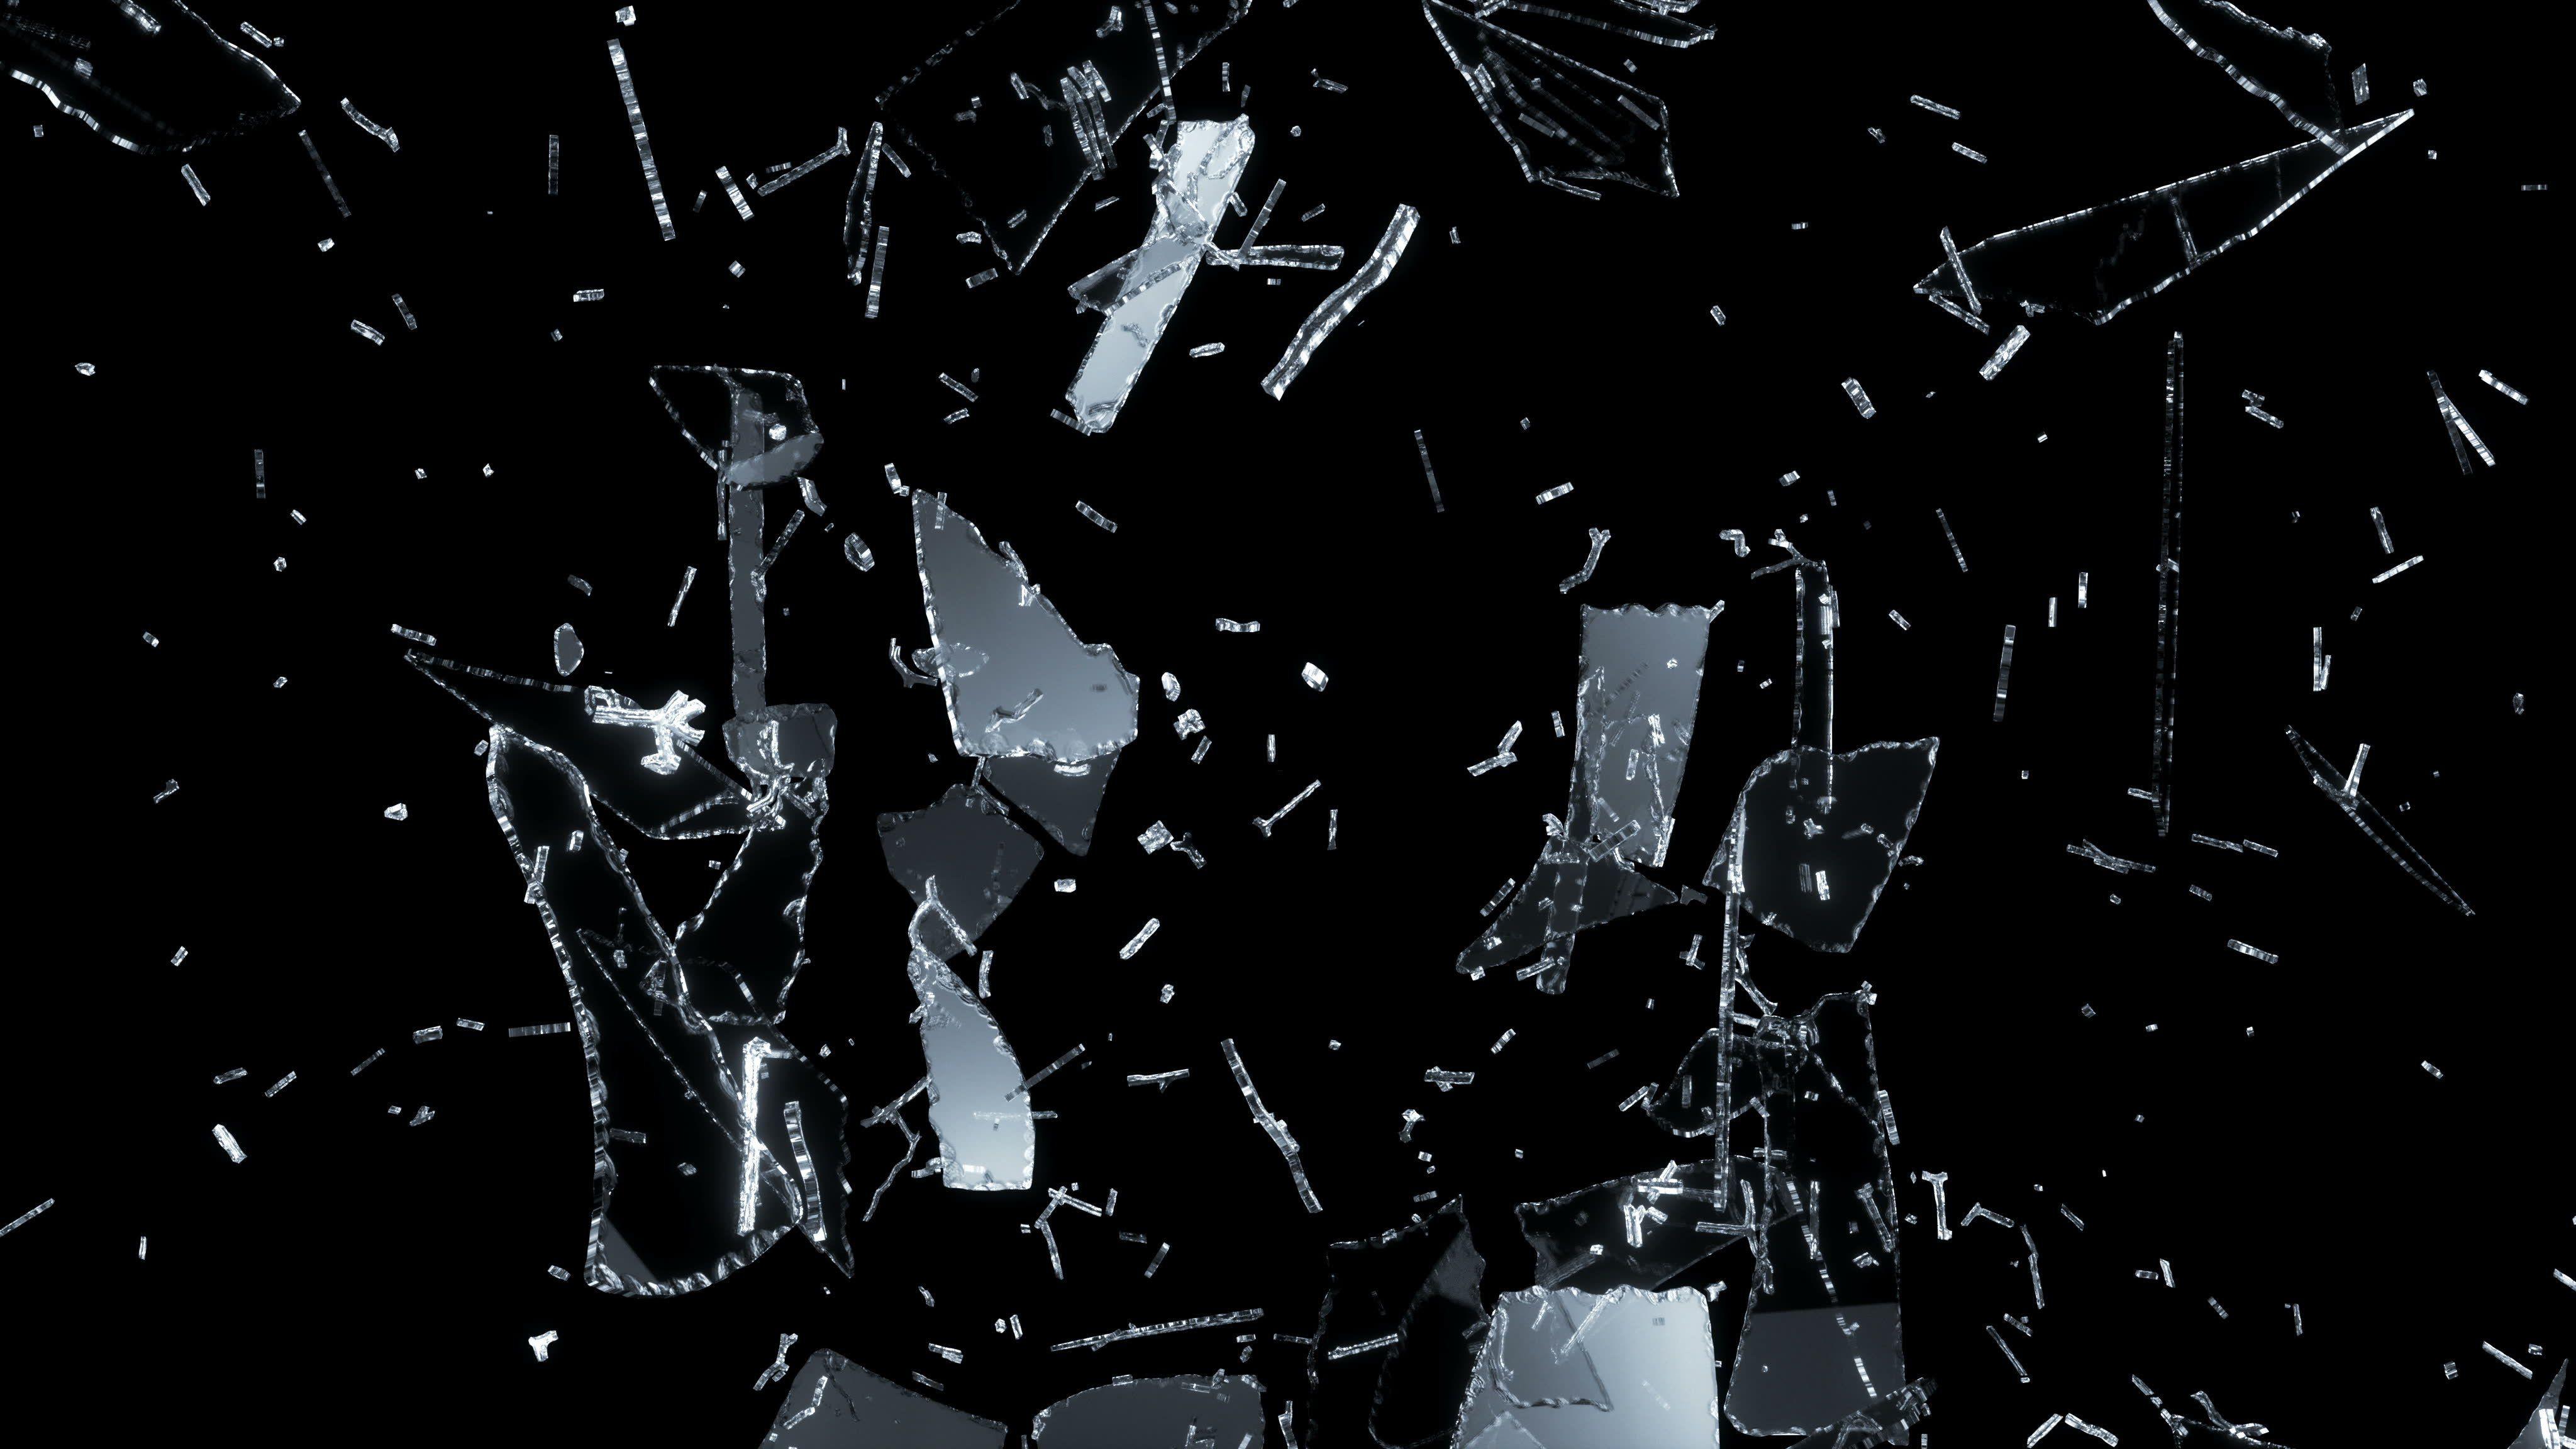 broken glass wallpapers widescreen syleol | wallpapers | pinterest